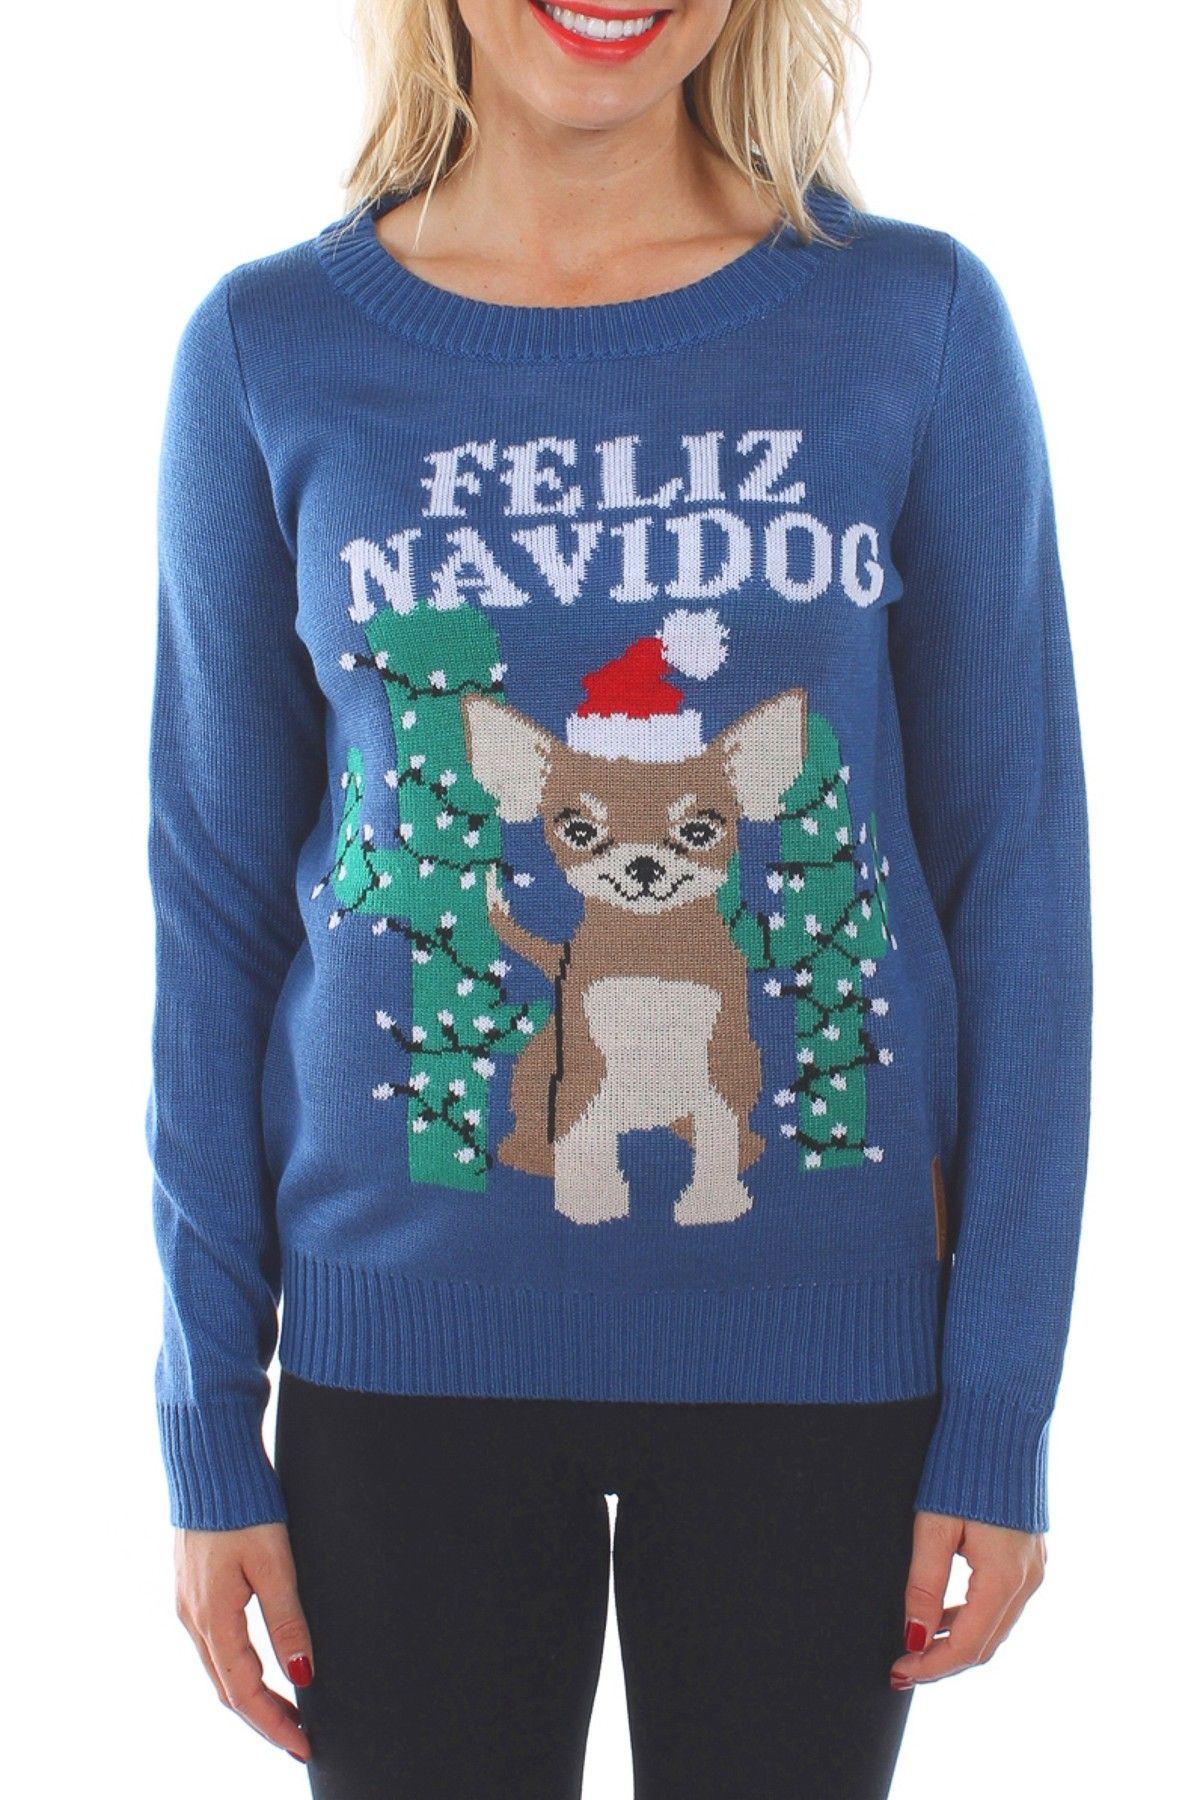 b1e335bcb60 Tipsy Elves Feliz Navidog Sweater Christmas Sweaters For Women